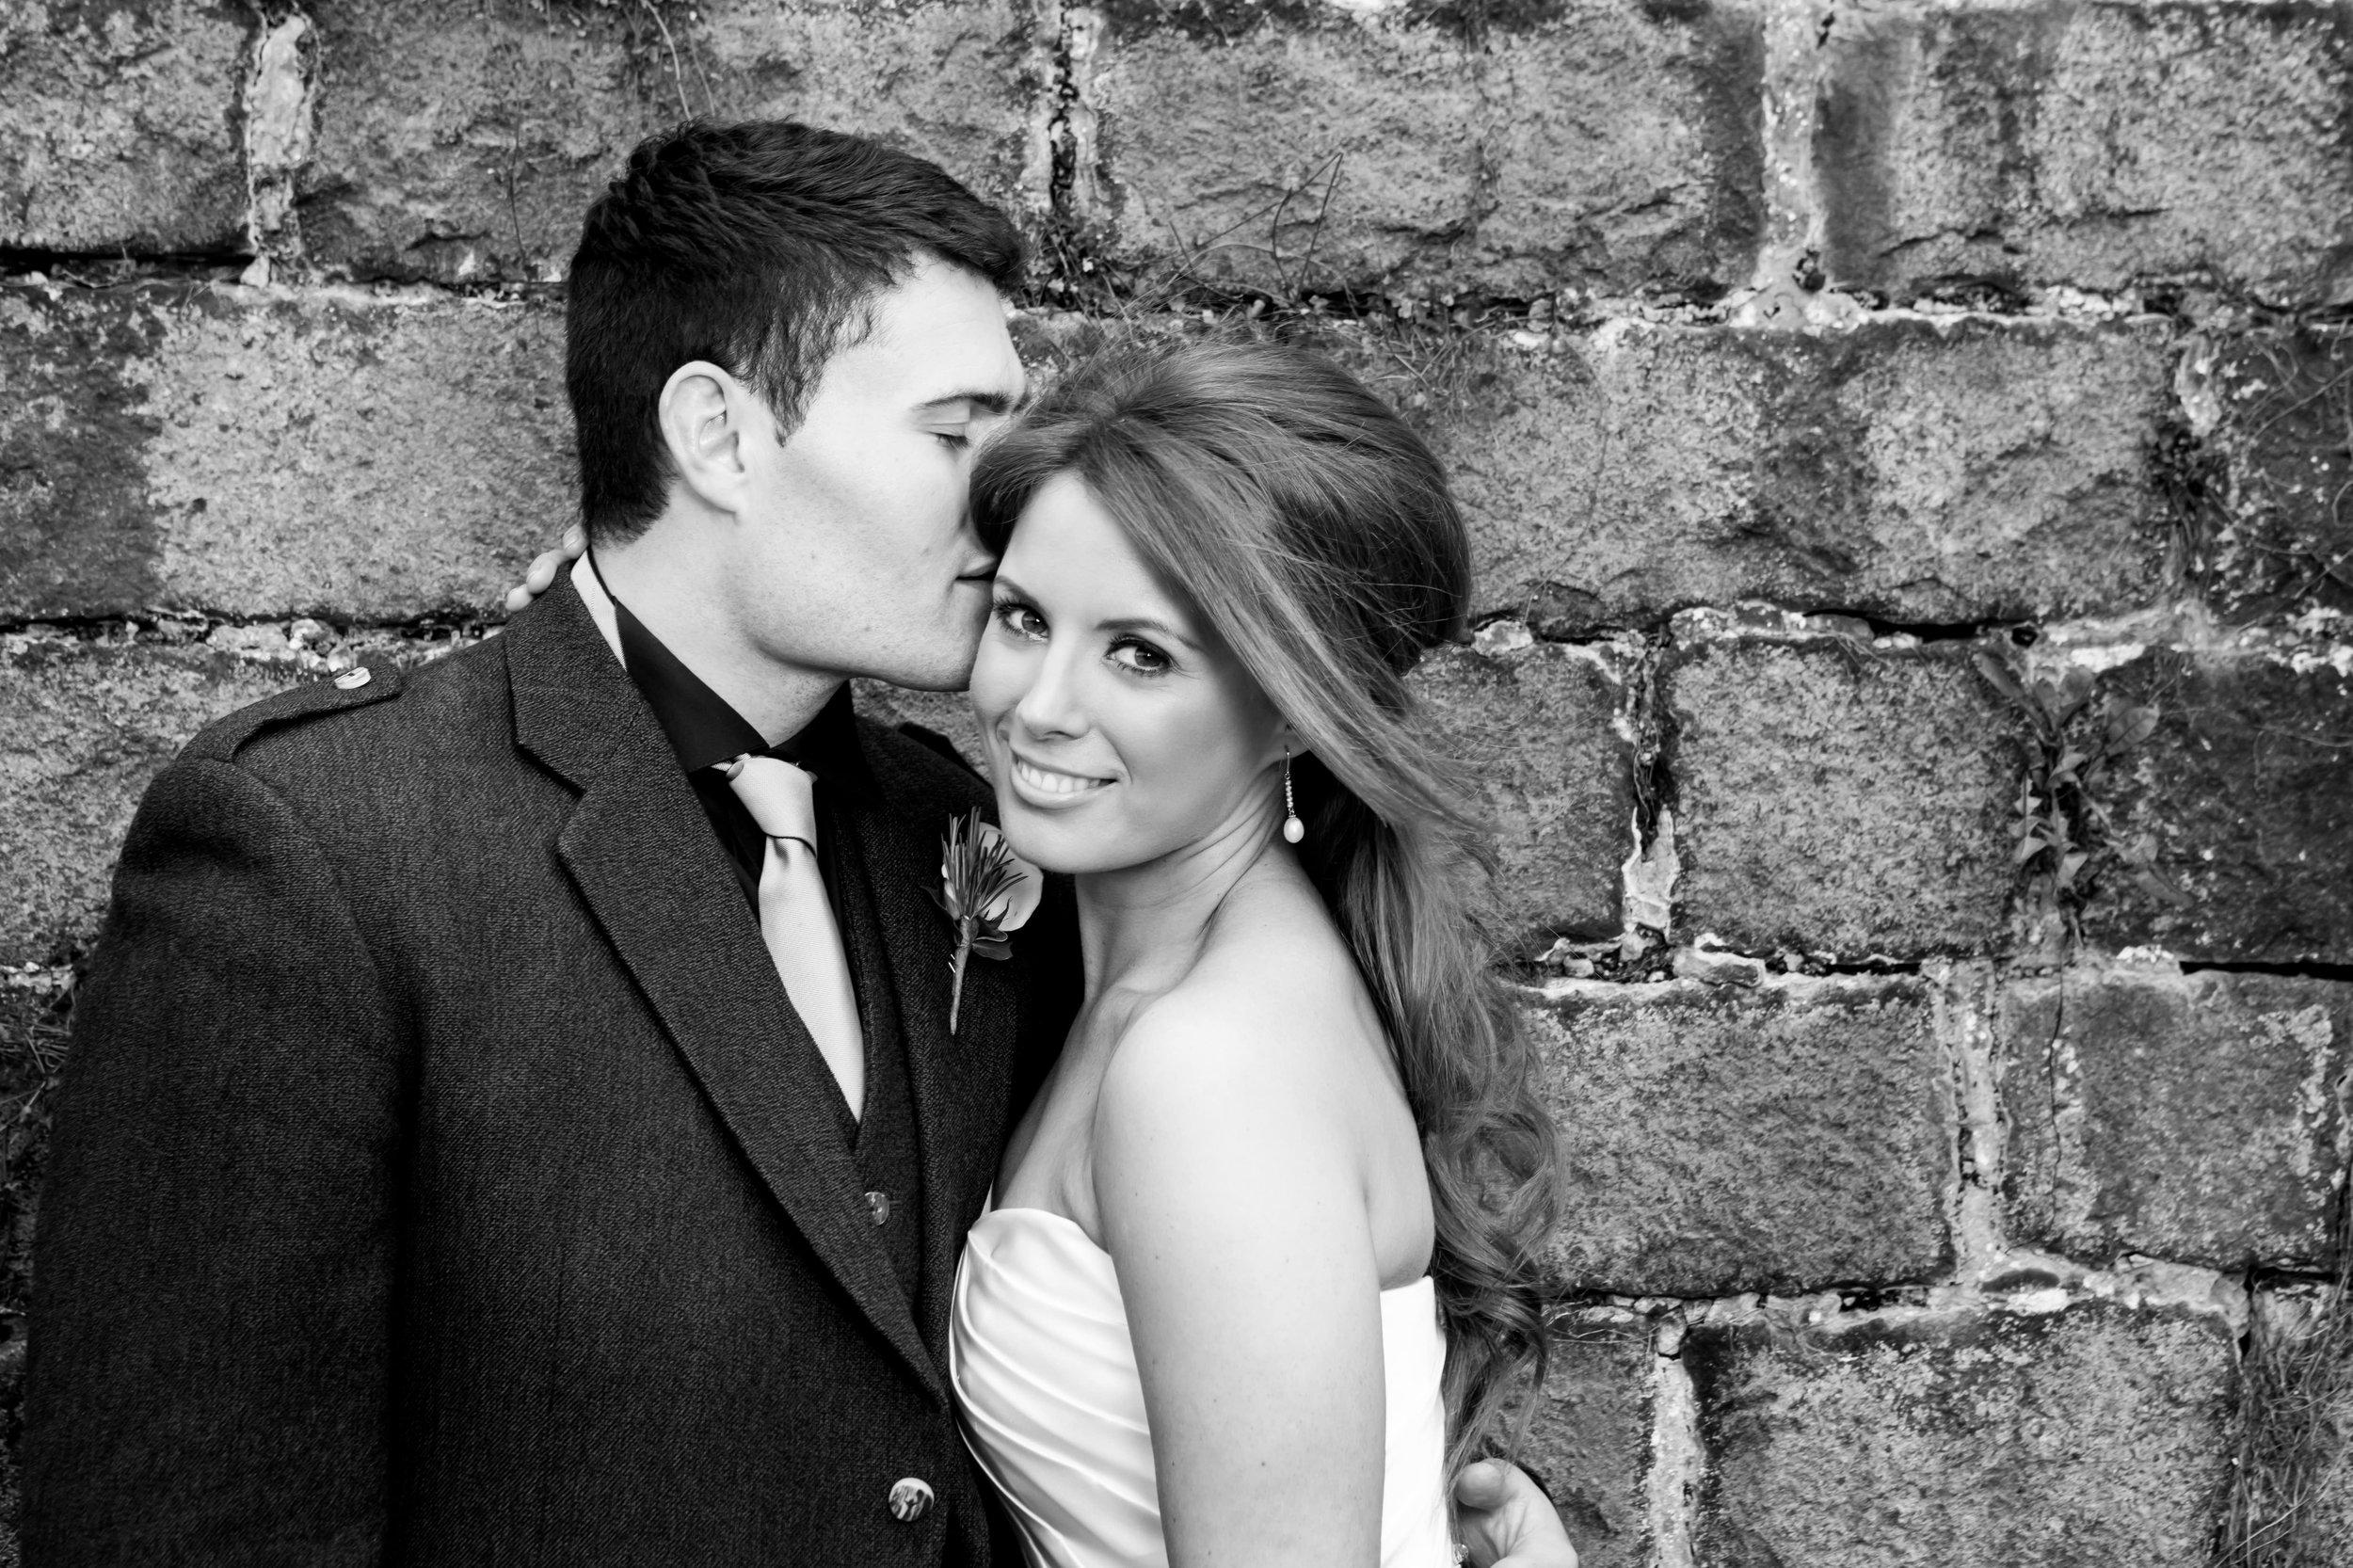 Engagement Shoots